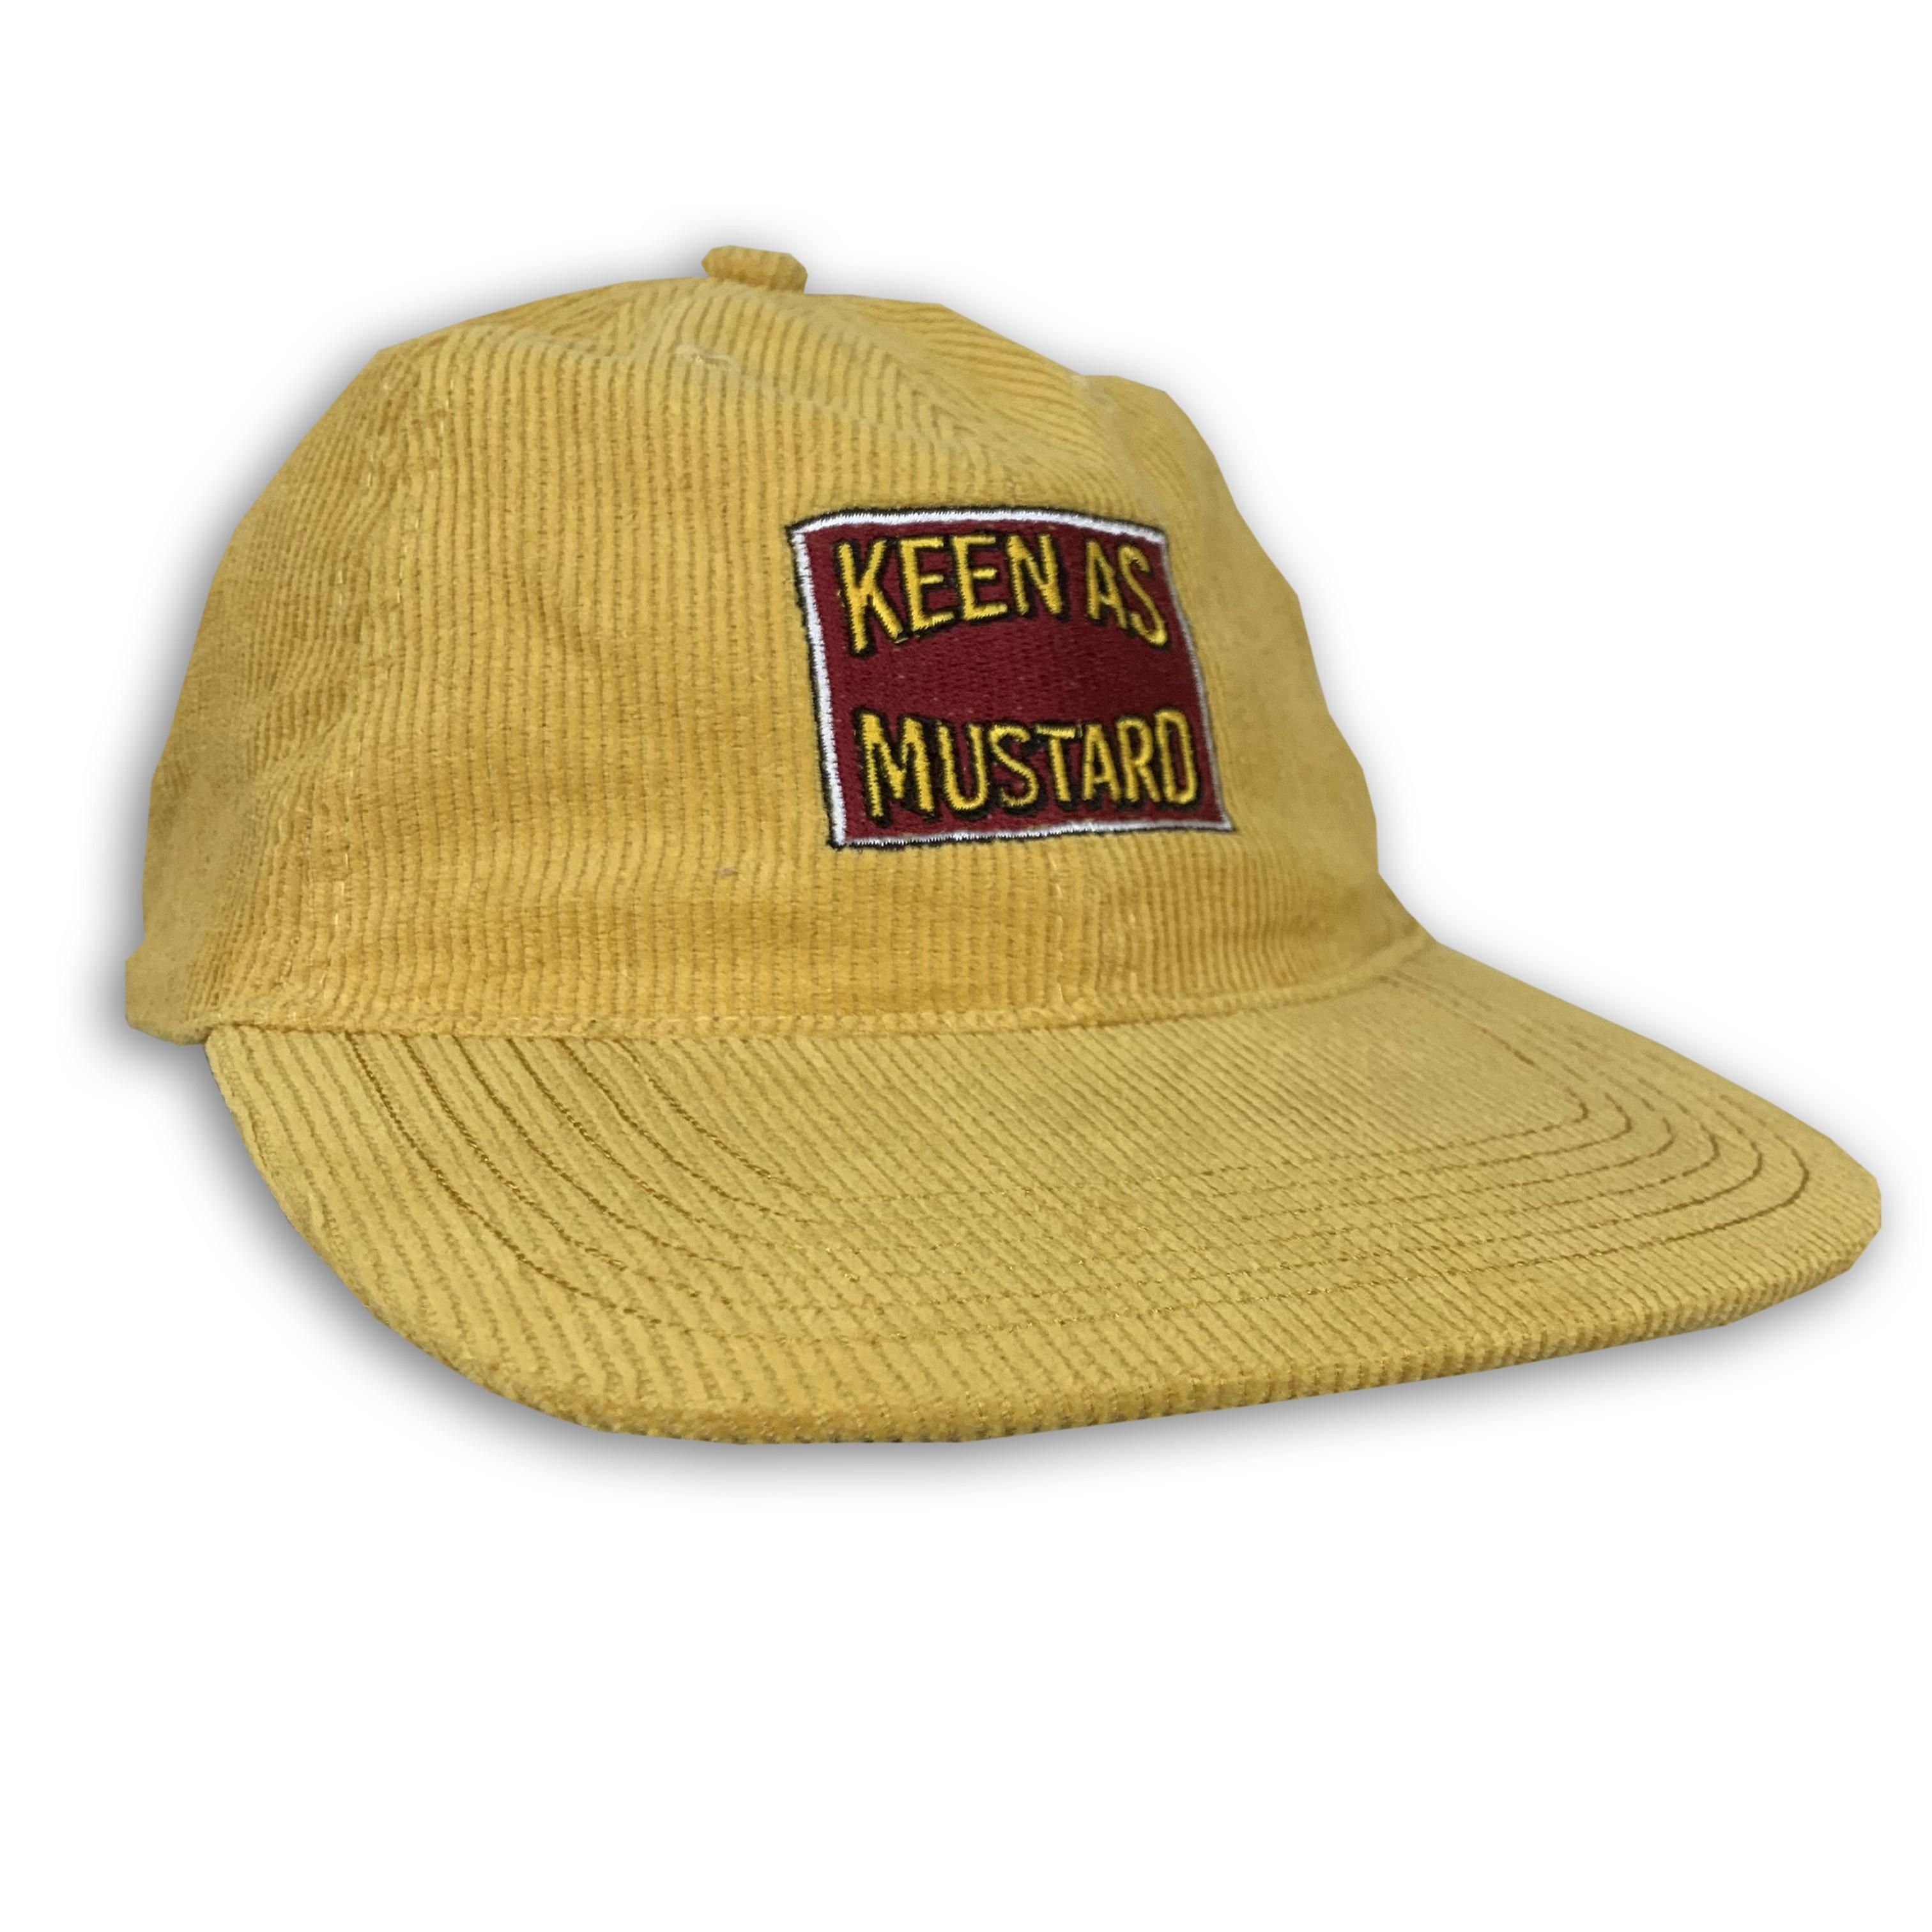 KEEN AS MUSTARD CORD HAT